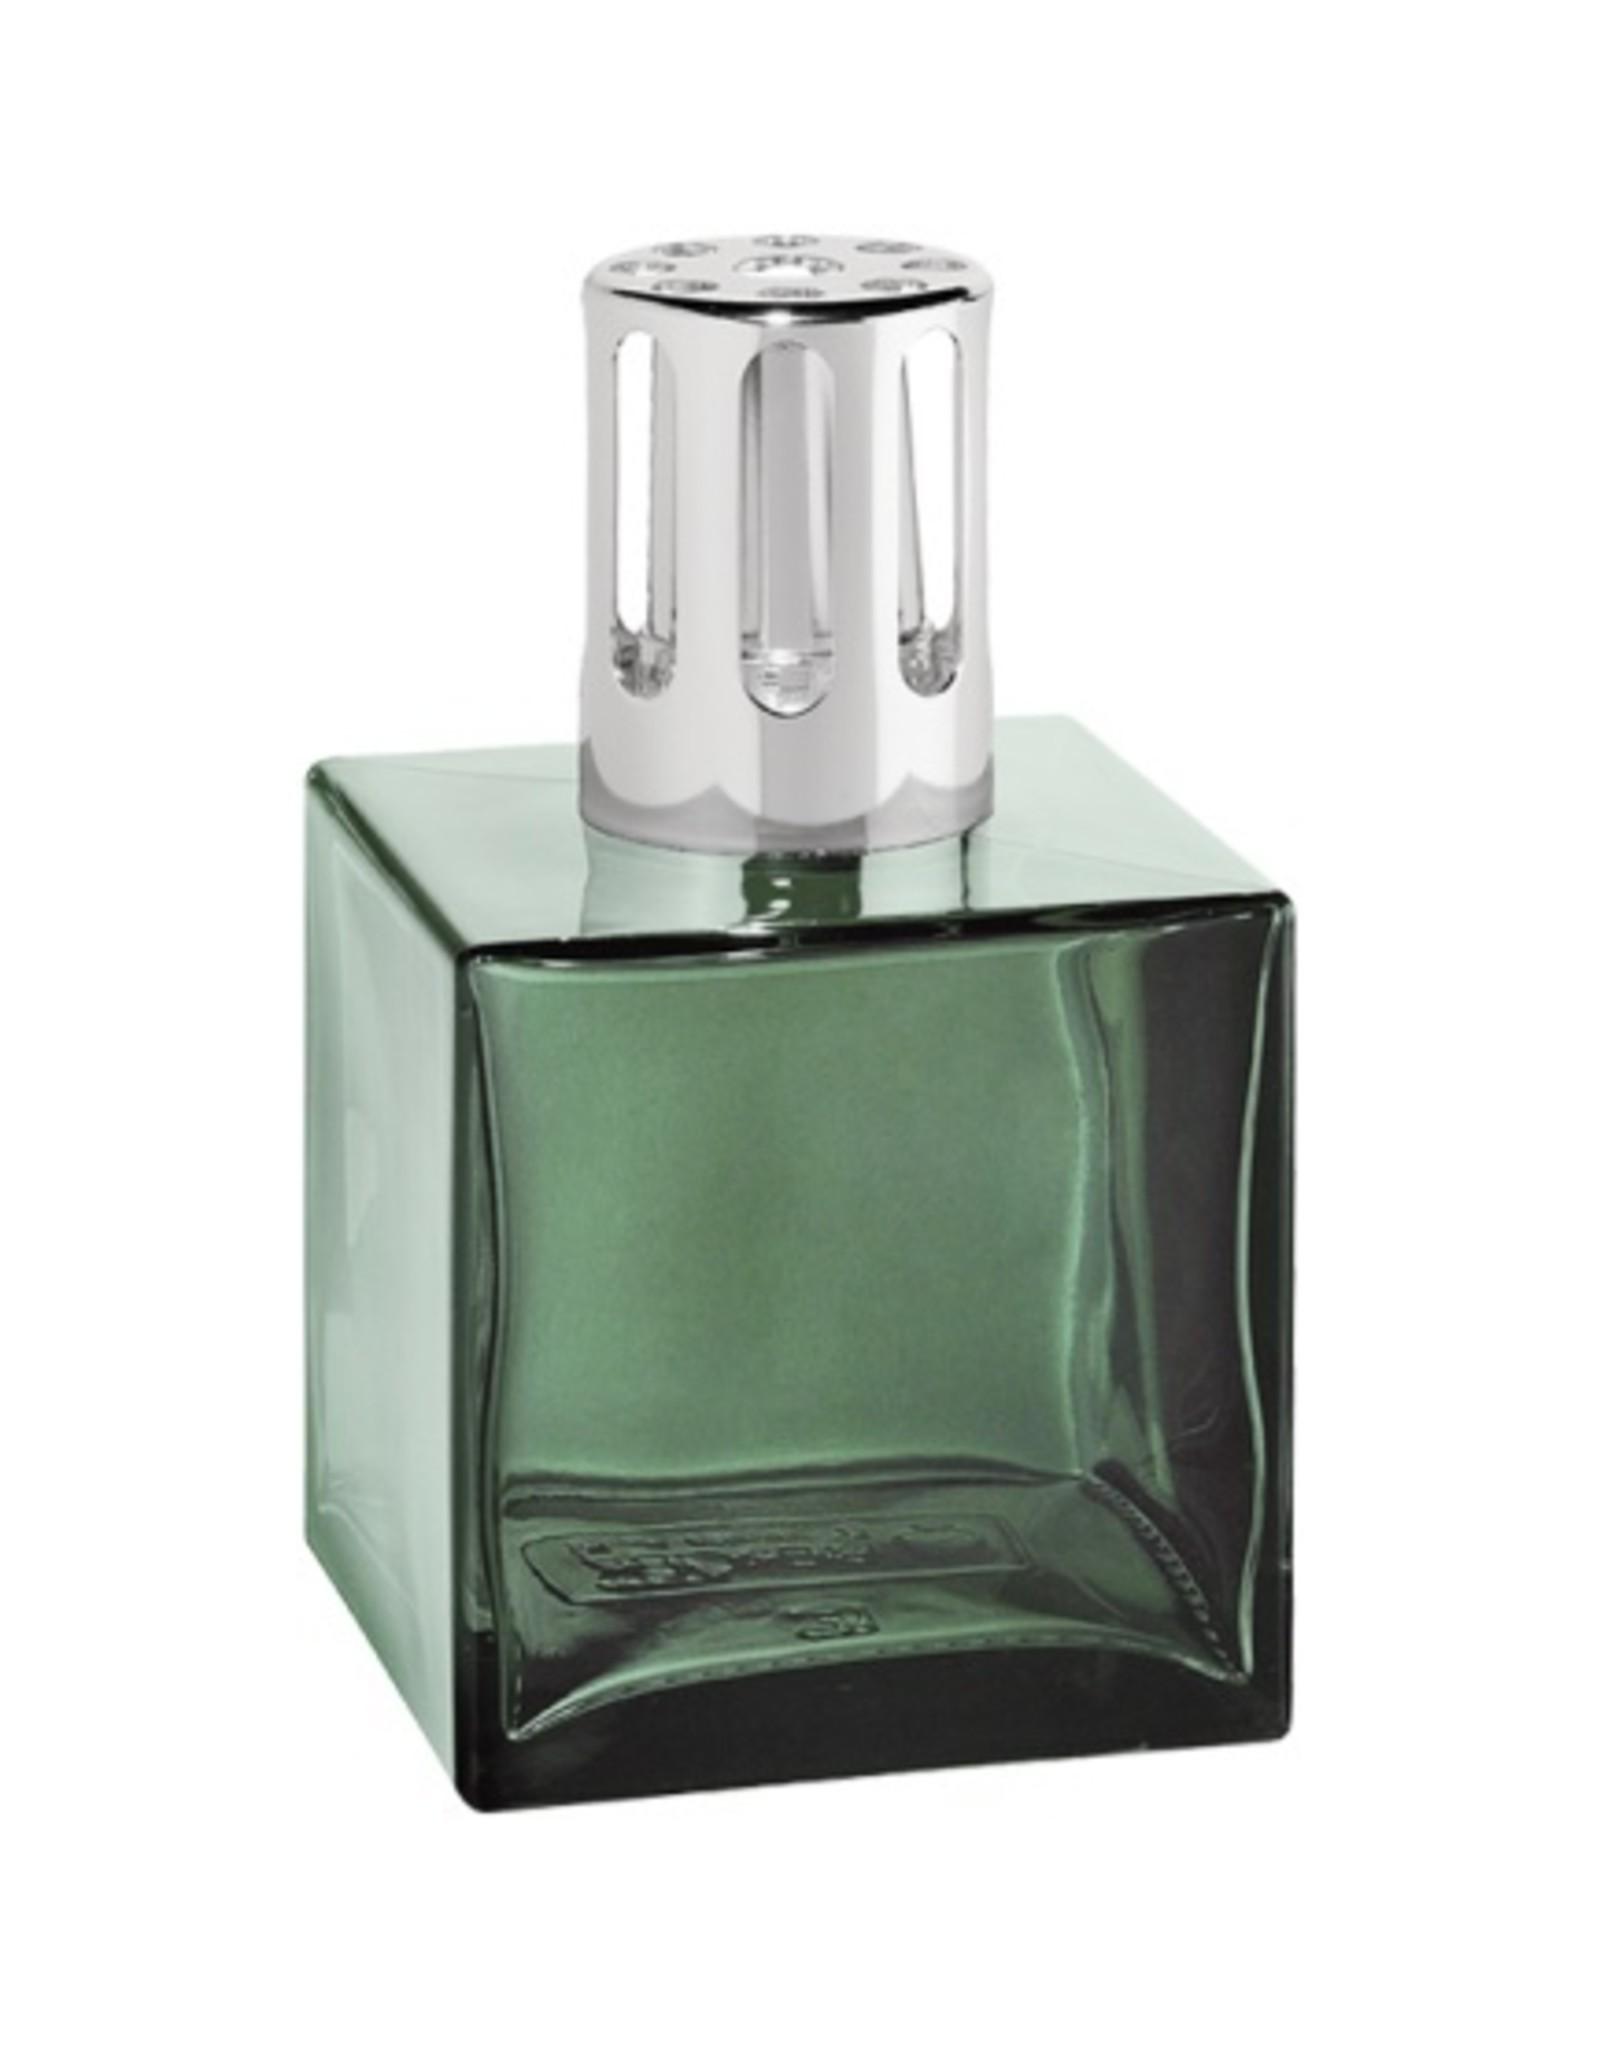 Maison Berger Cube Green Fragrance Lamp